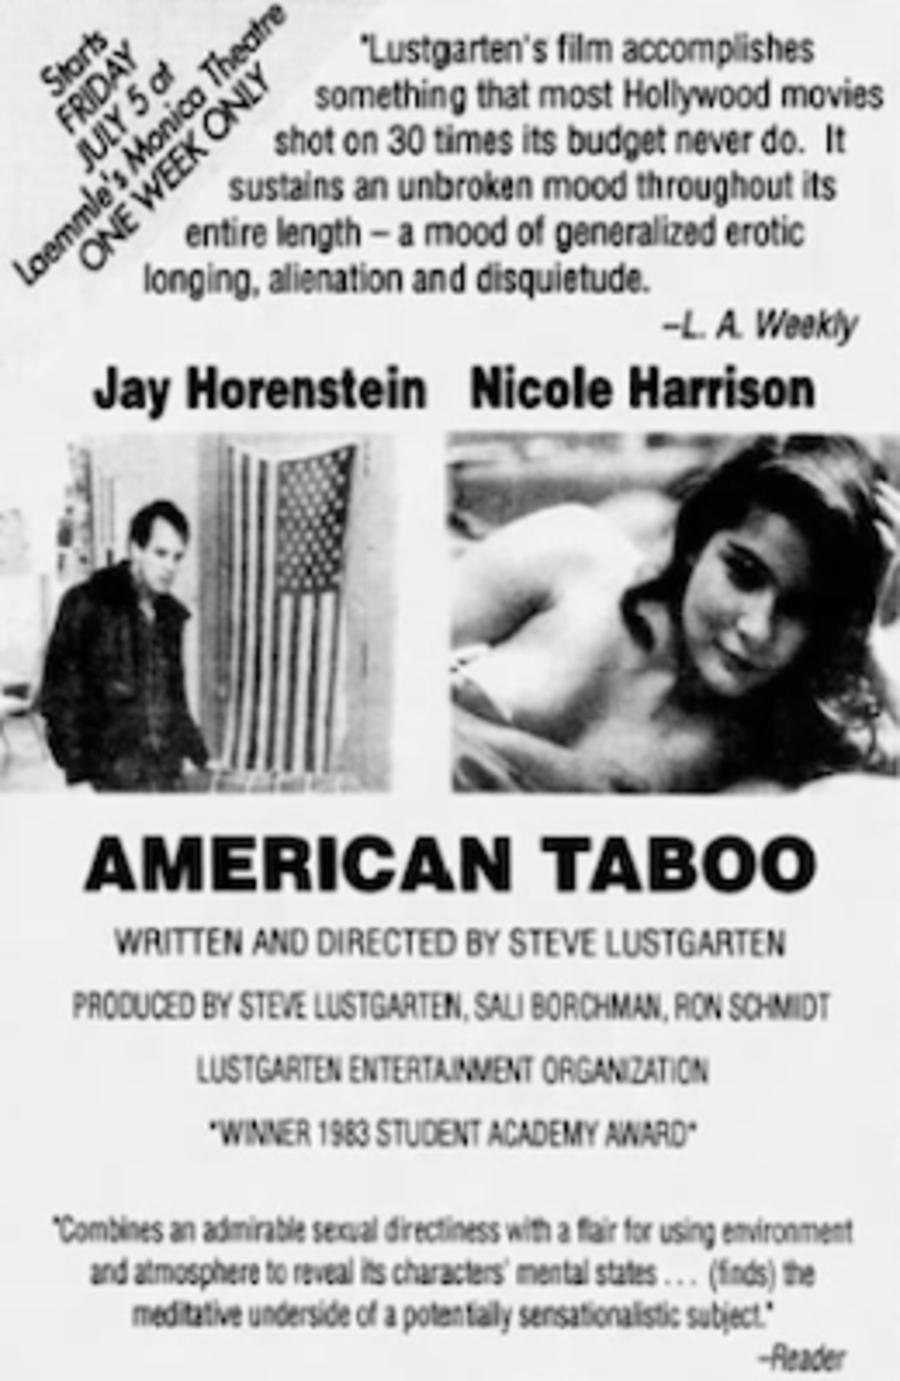 American Taboo